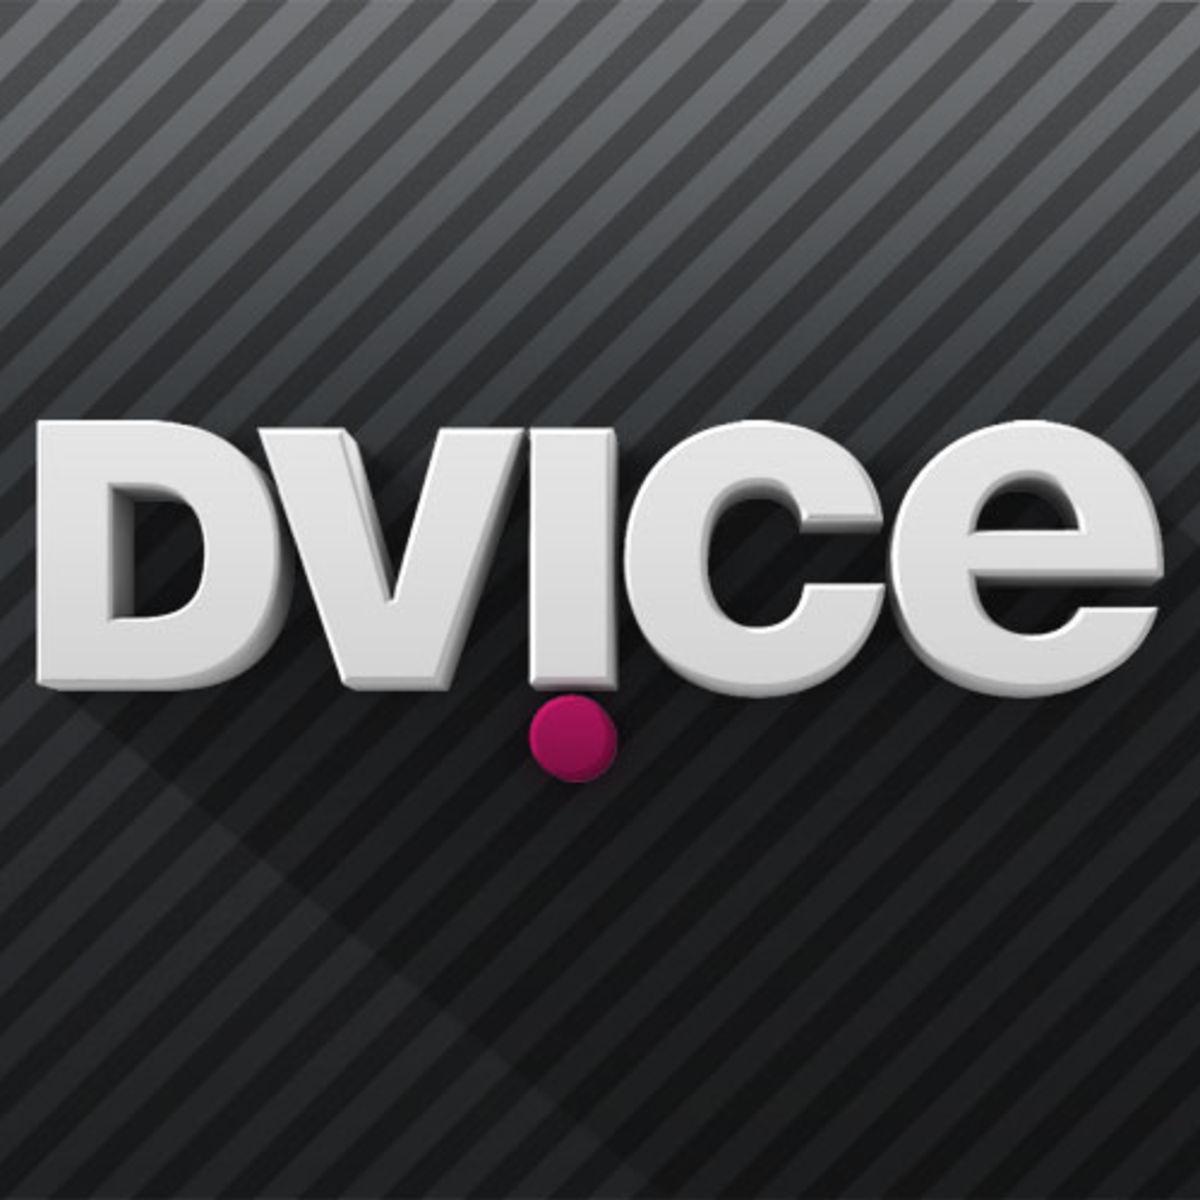 dvice_logo[1].jpeg